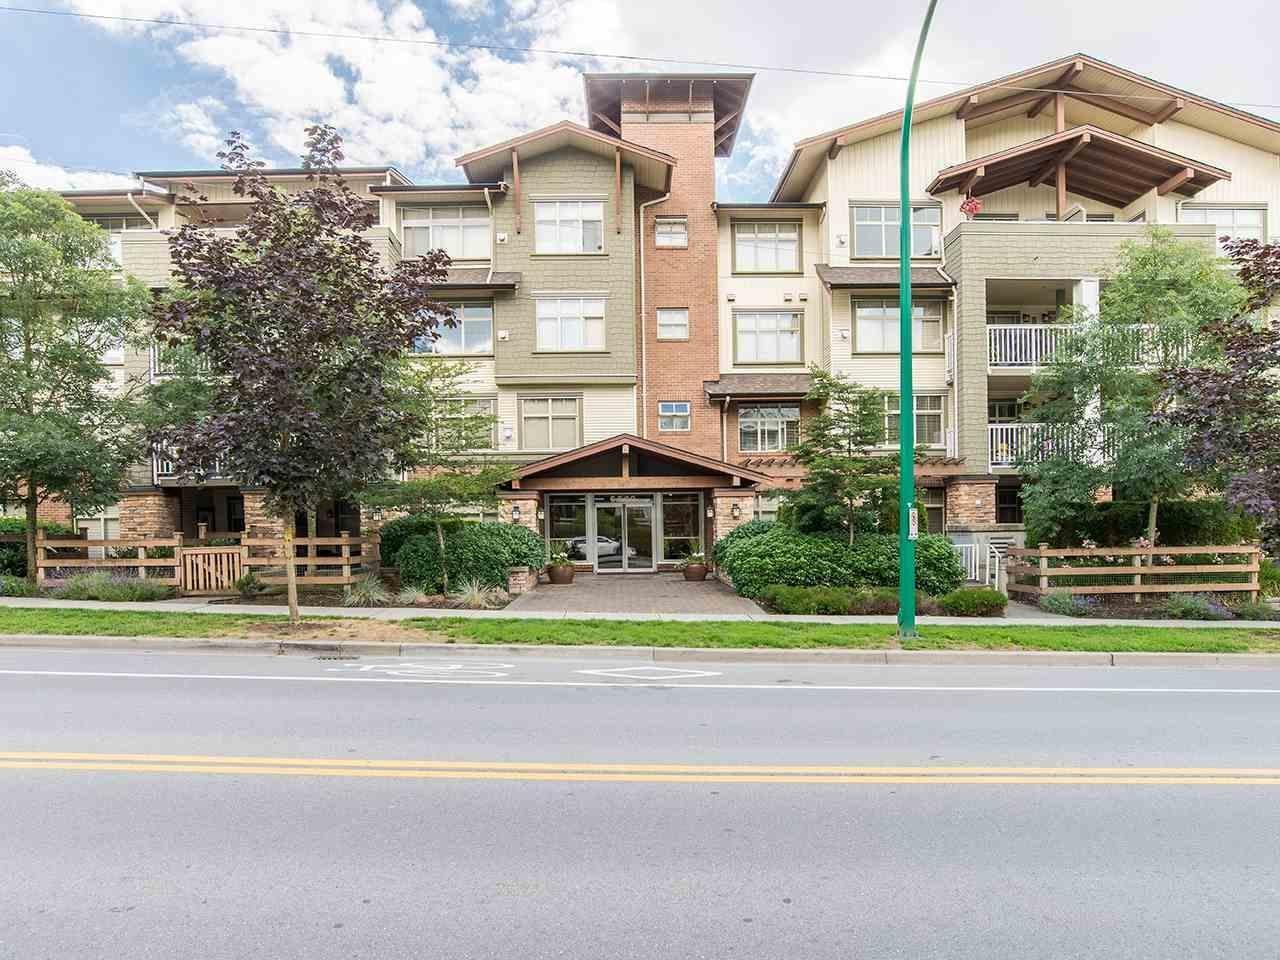 R2098084 - 301 6500 194 STREET, Clayton, Surrey, BC - Apartment Unit